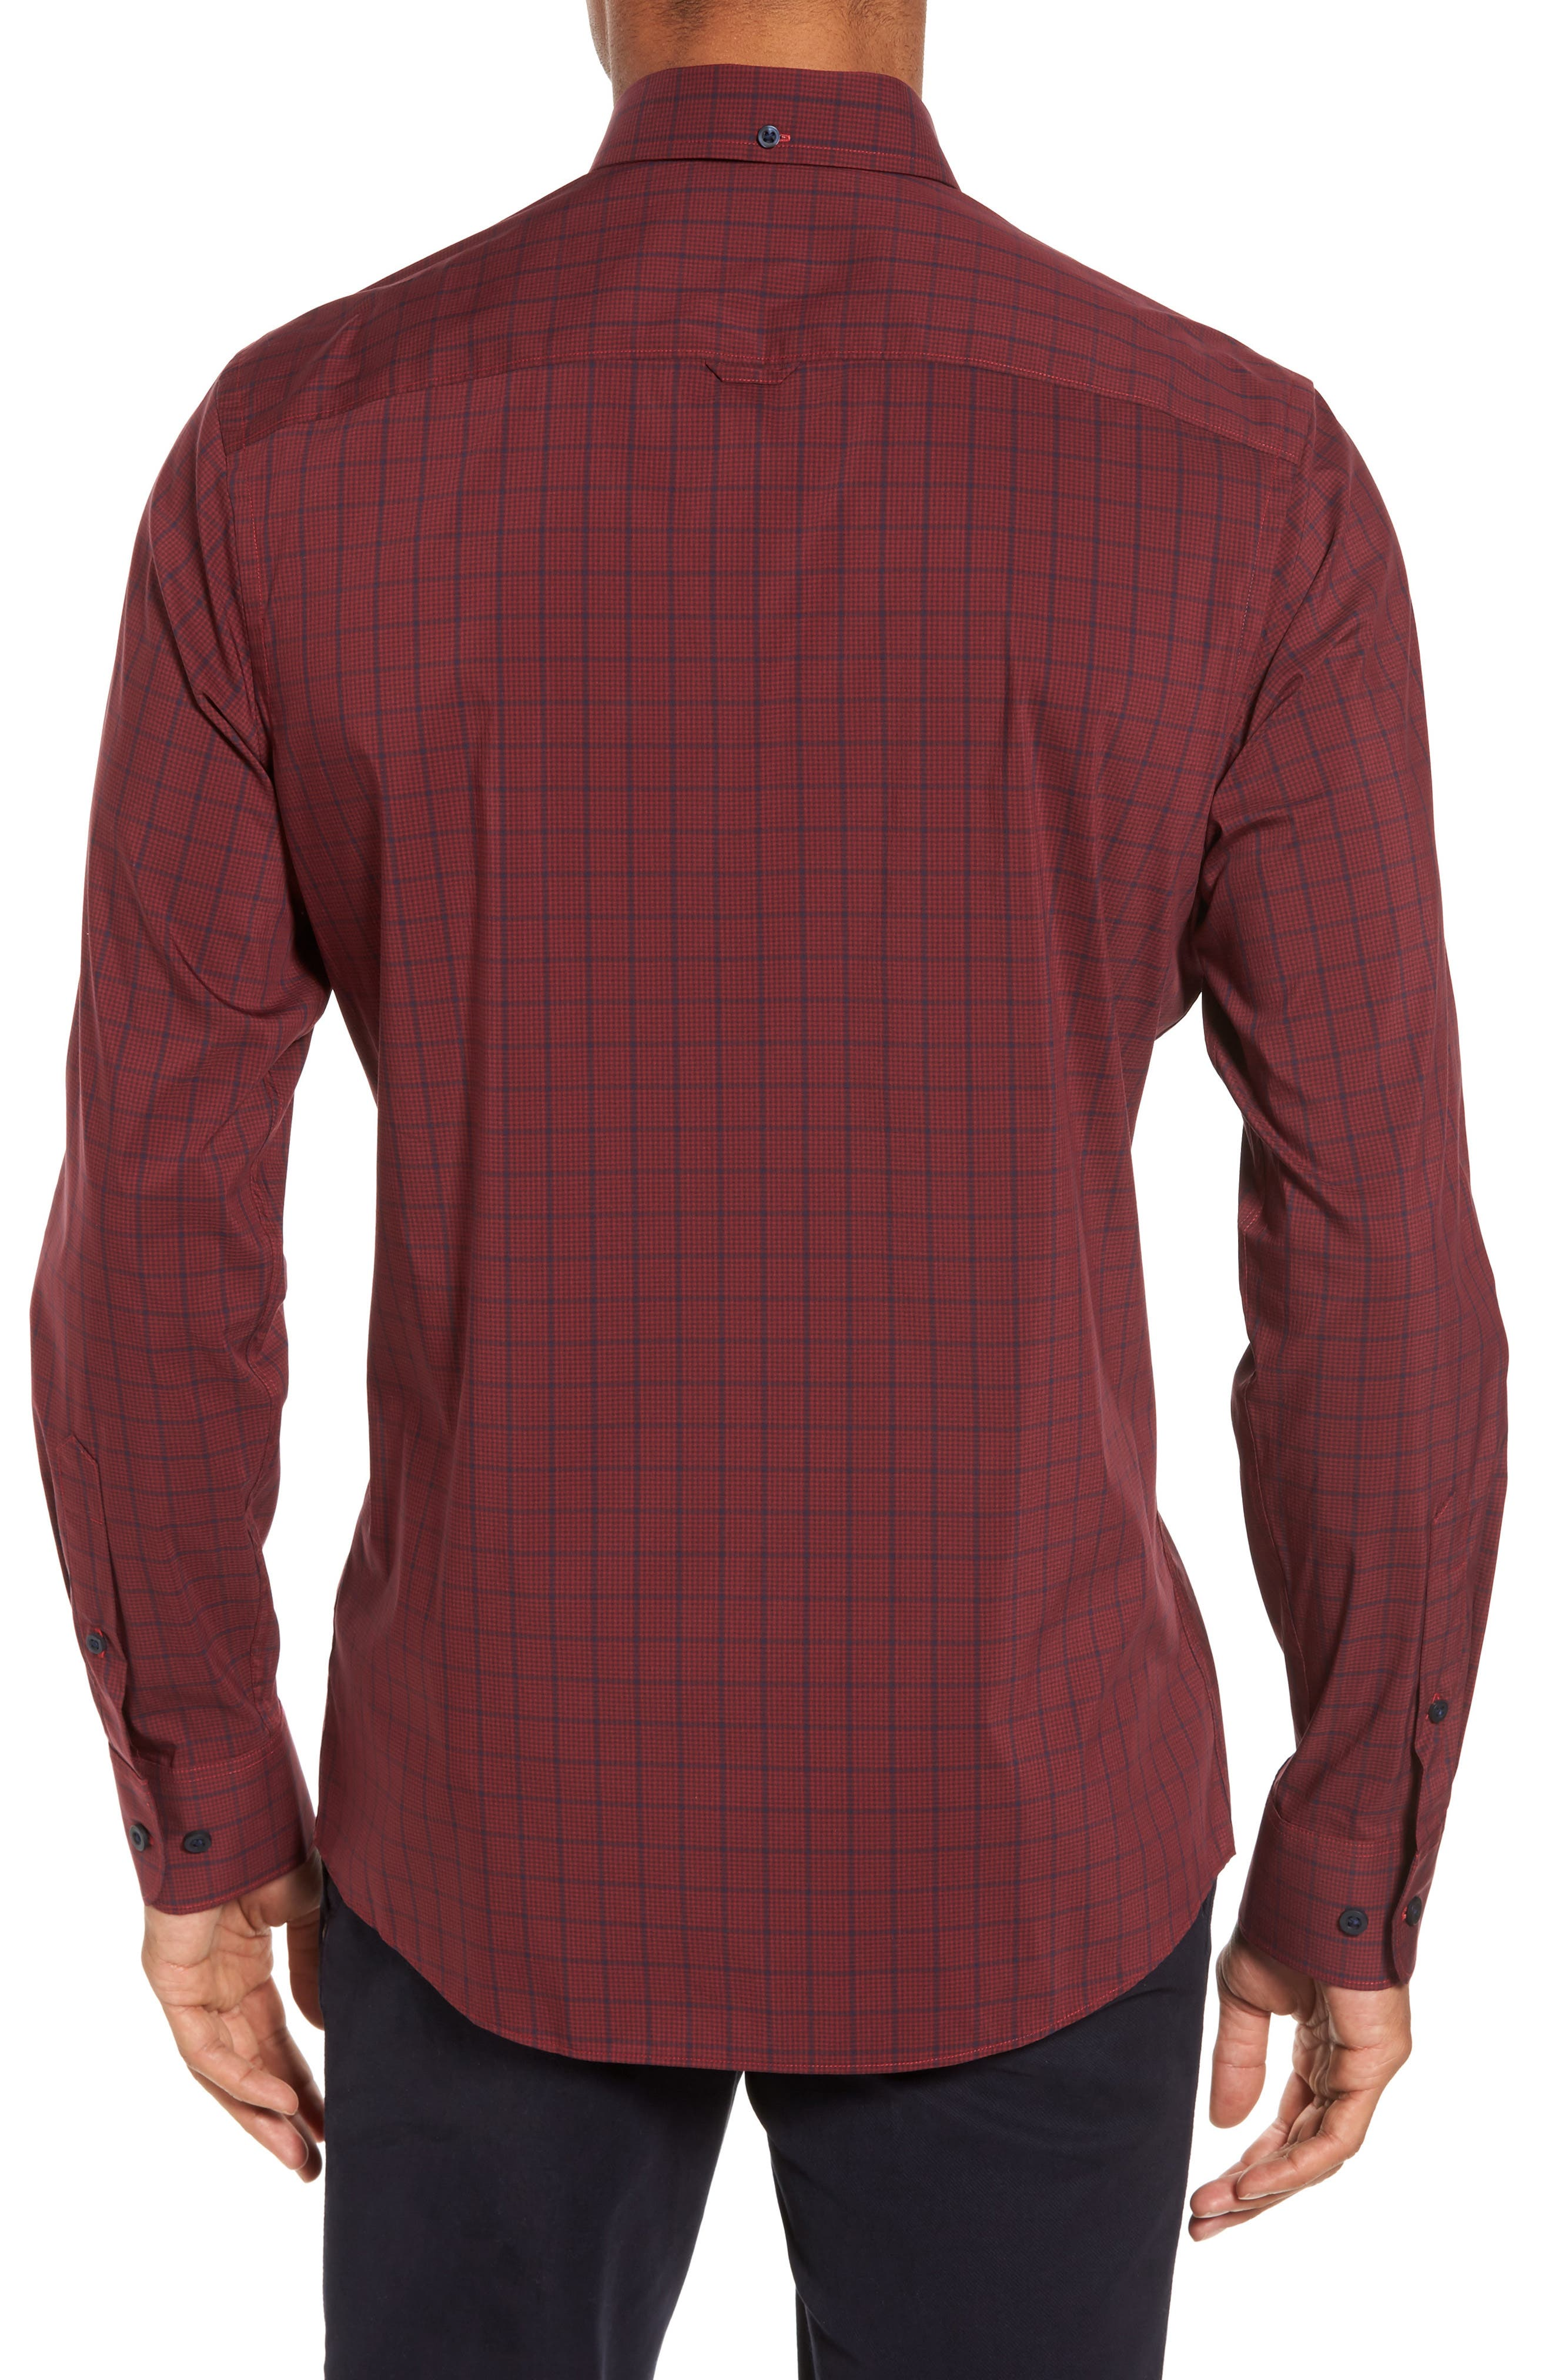 Spade Tech-Smart Plaid Sport Shirt,                             Alternate thumbnail 3, color,                             Burgundy Stem Grid Plaid